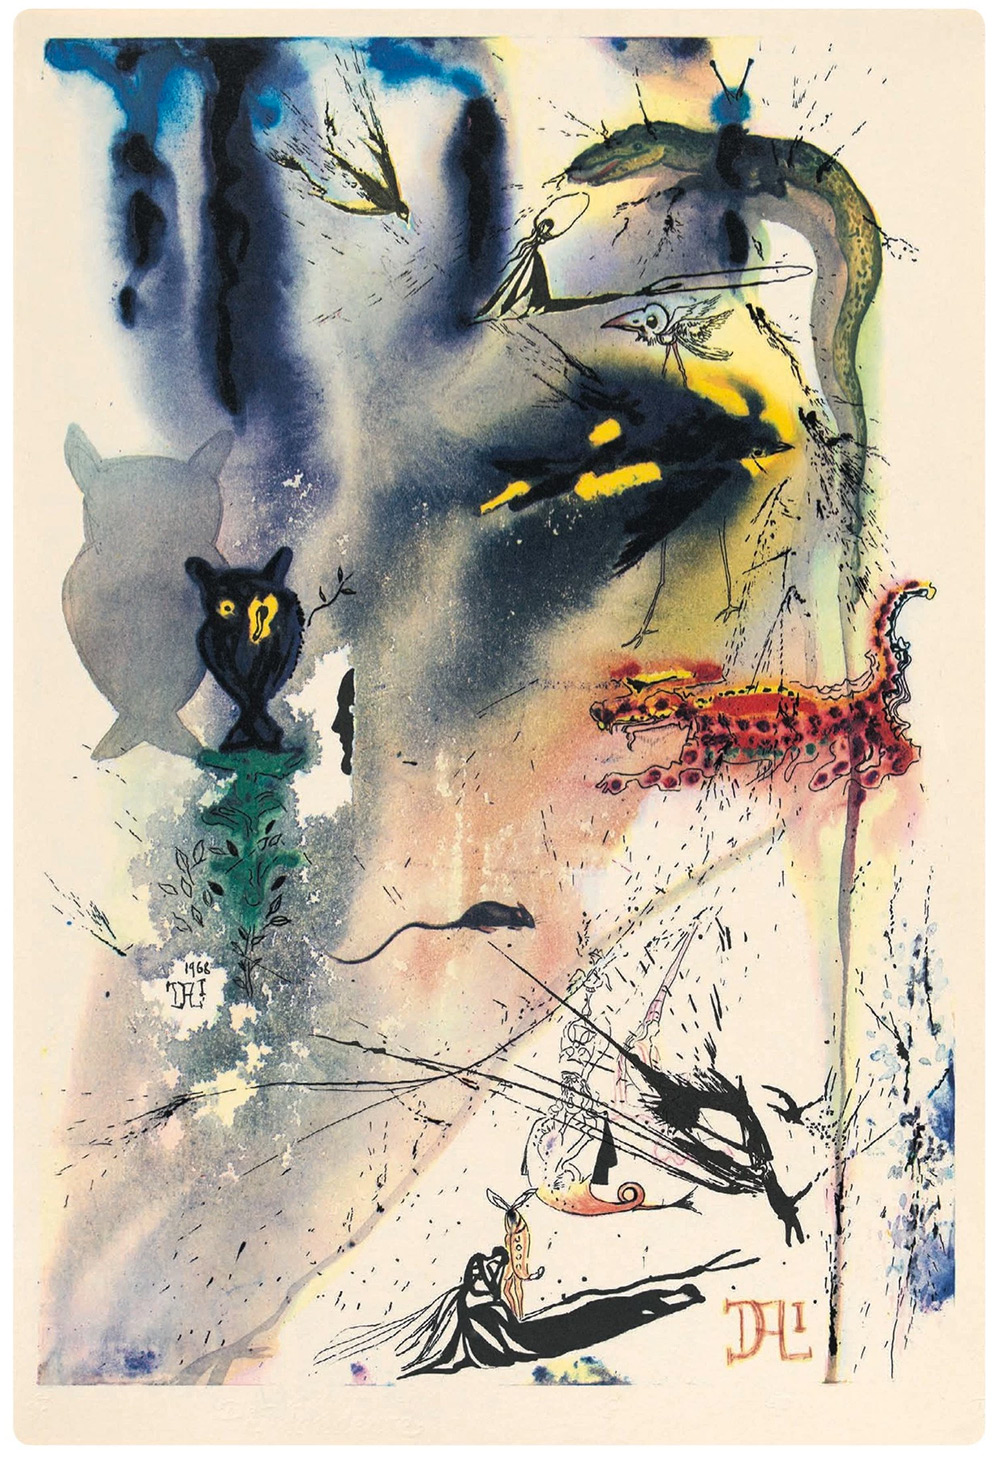 dali-alice-pays-merveille-livre-illustration-04